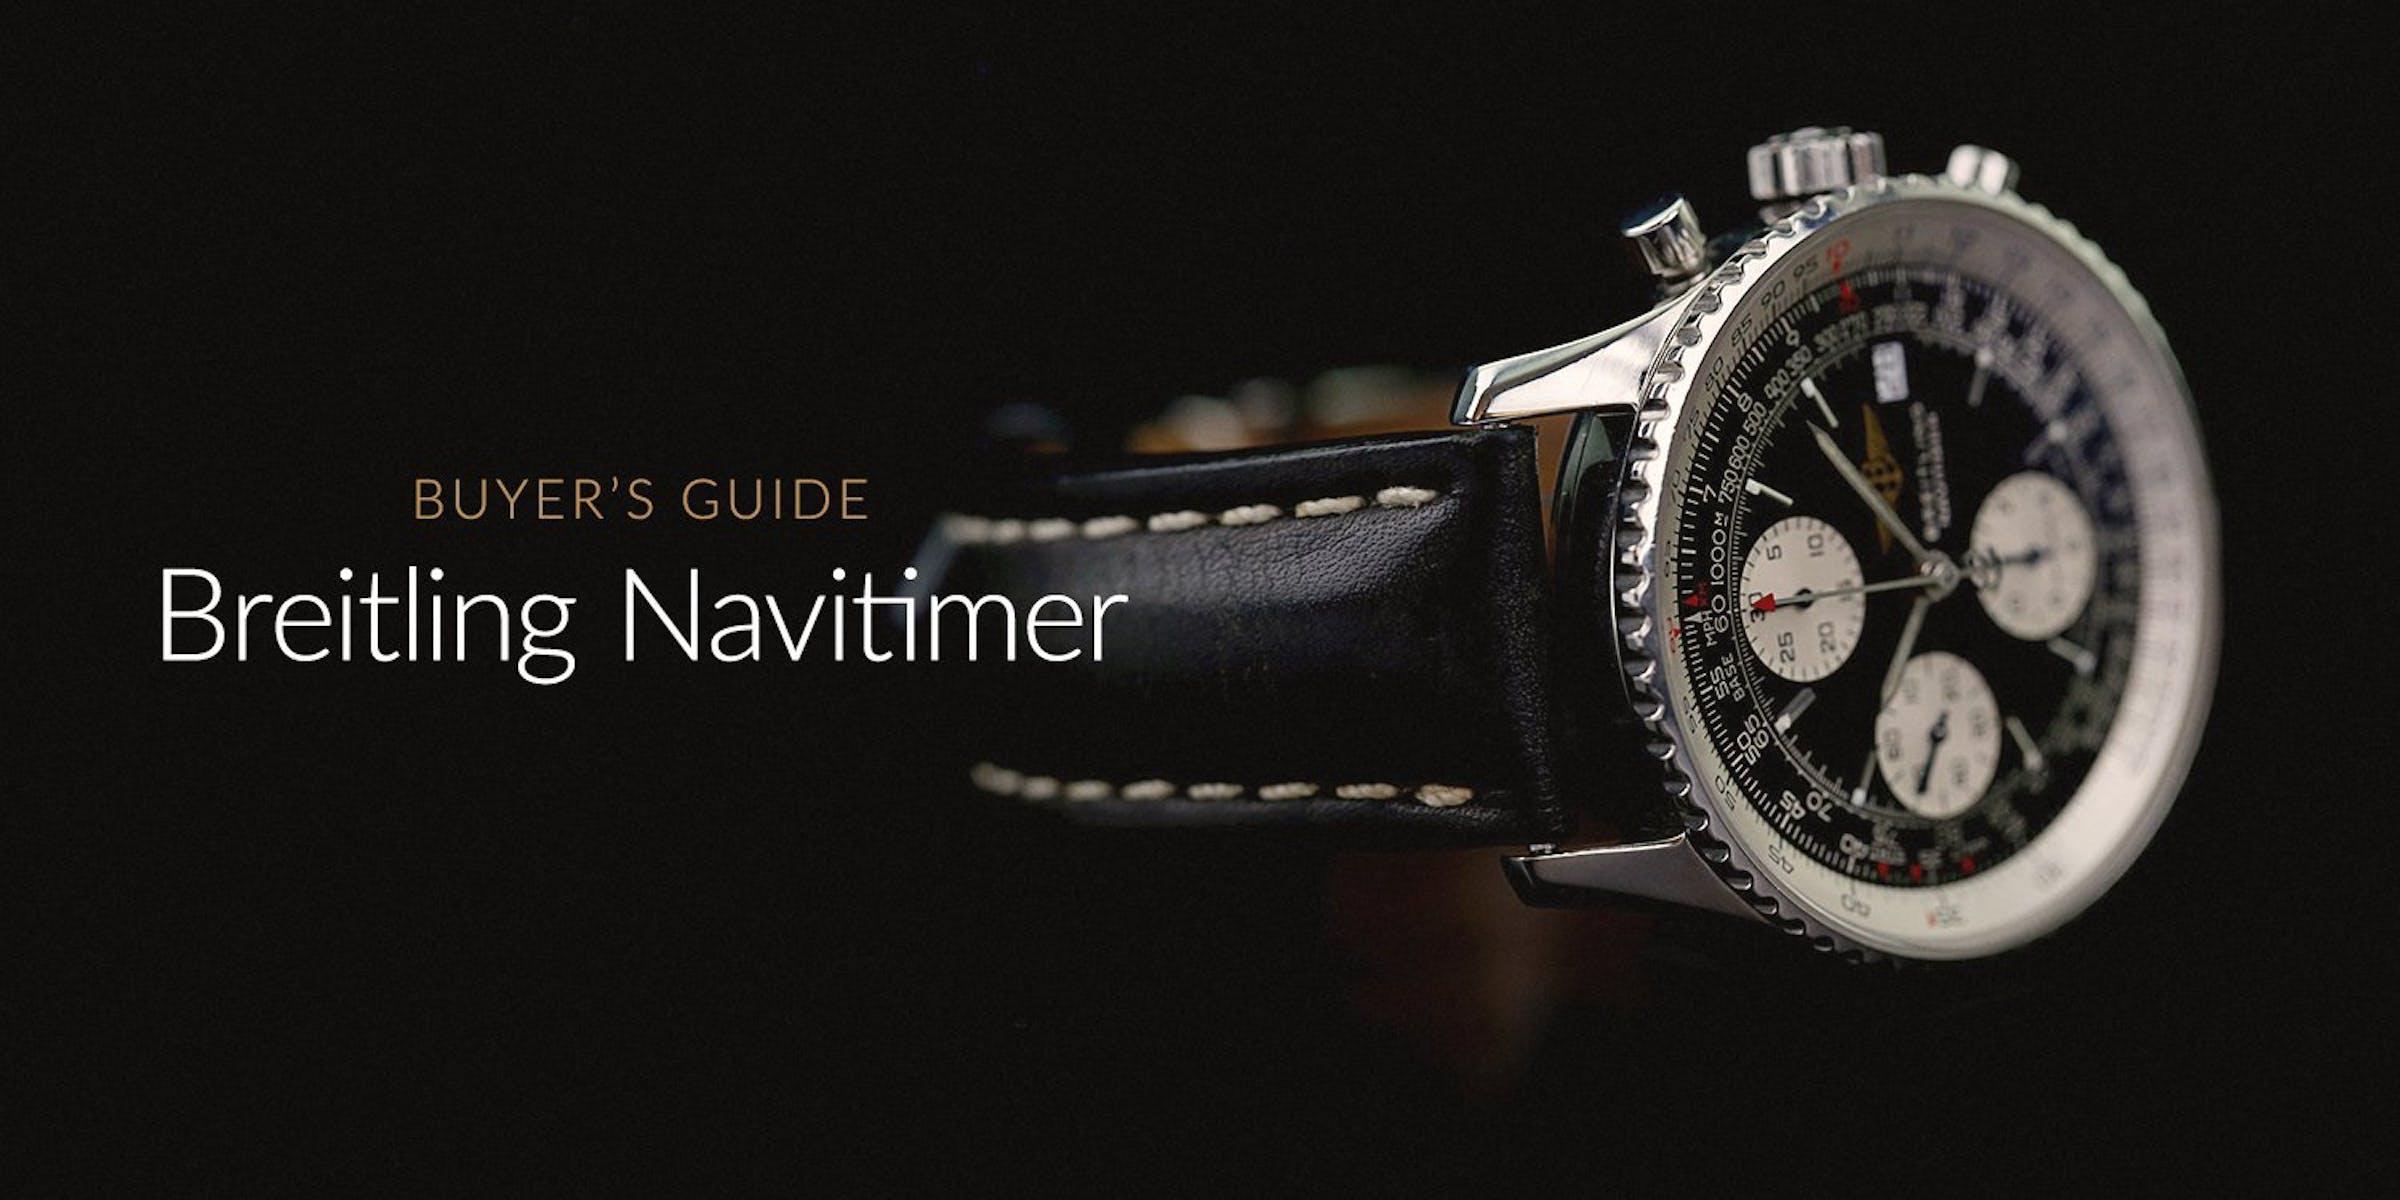 CAM-1292-Buyers-Guide-Breitling-Navitimer-2-1-DE